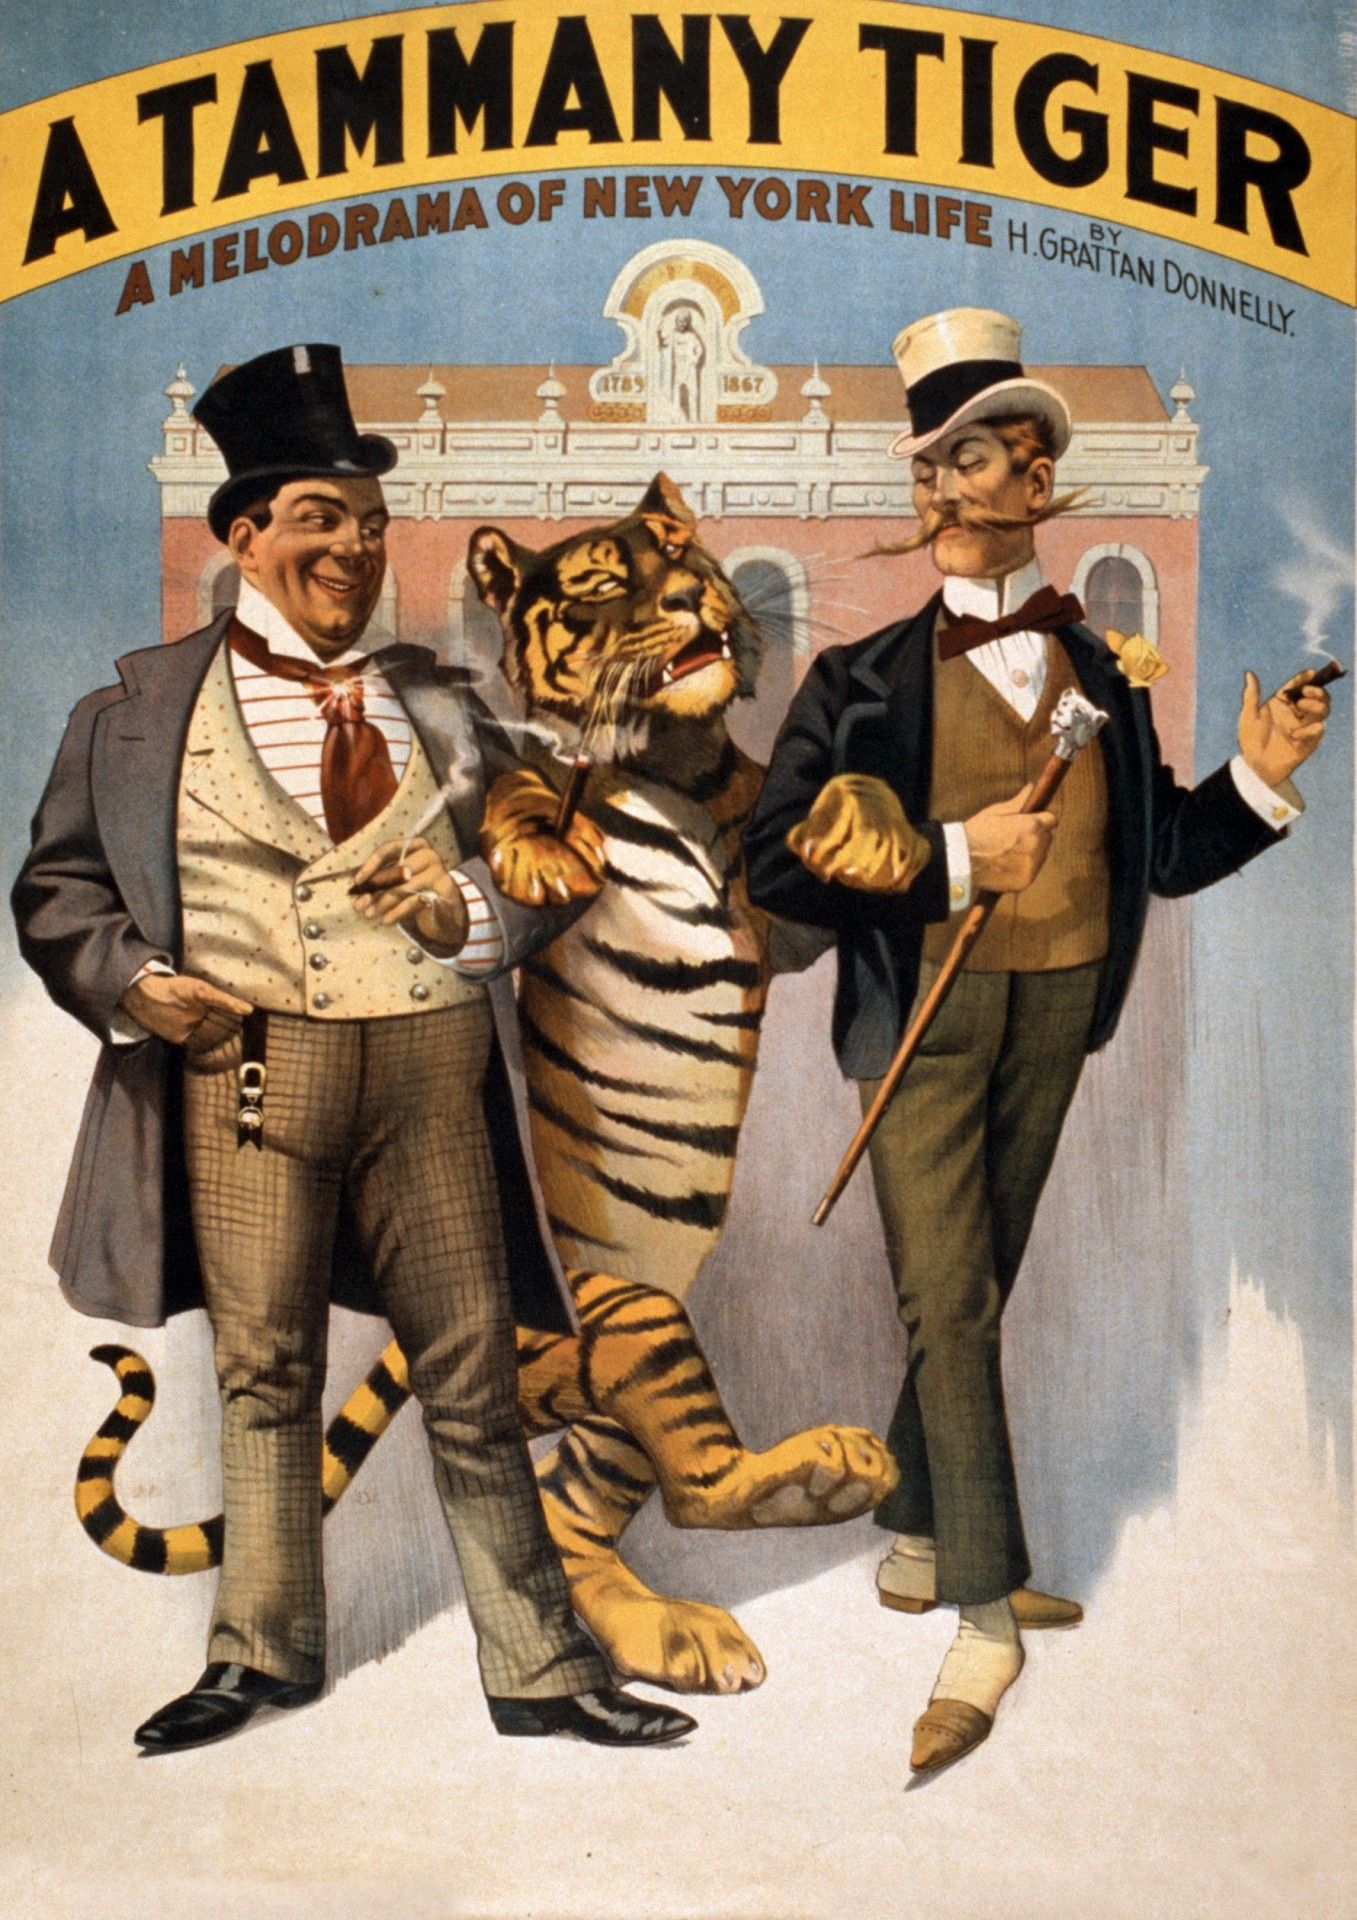 Tammy Tiger Vintage Poster Free Stock Photo Vintage